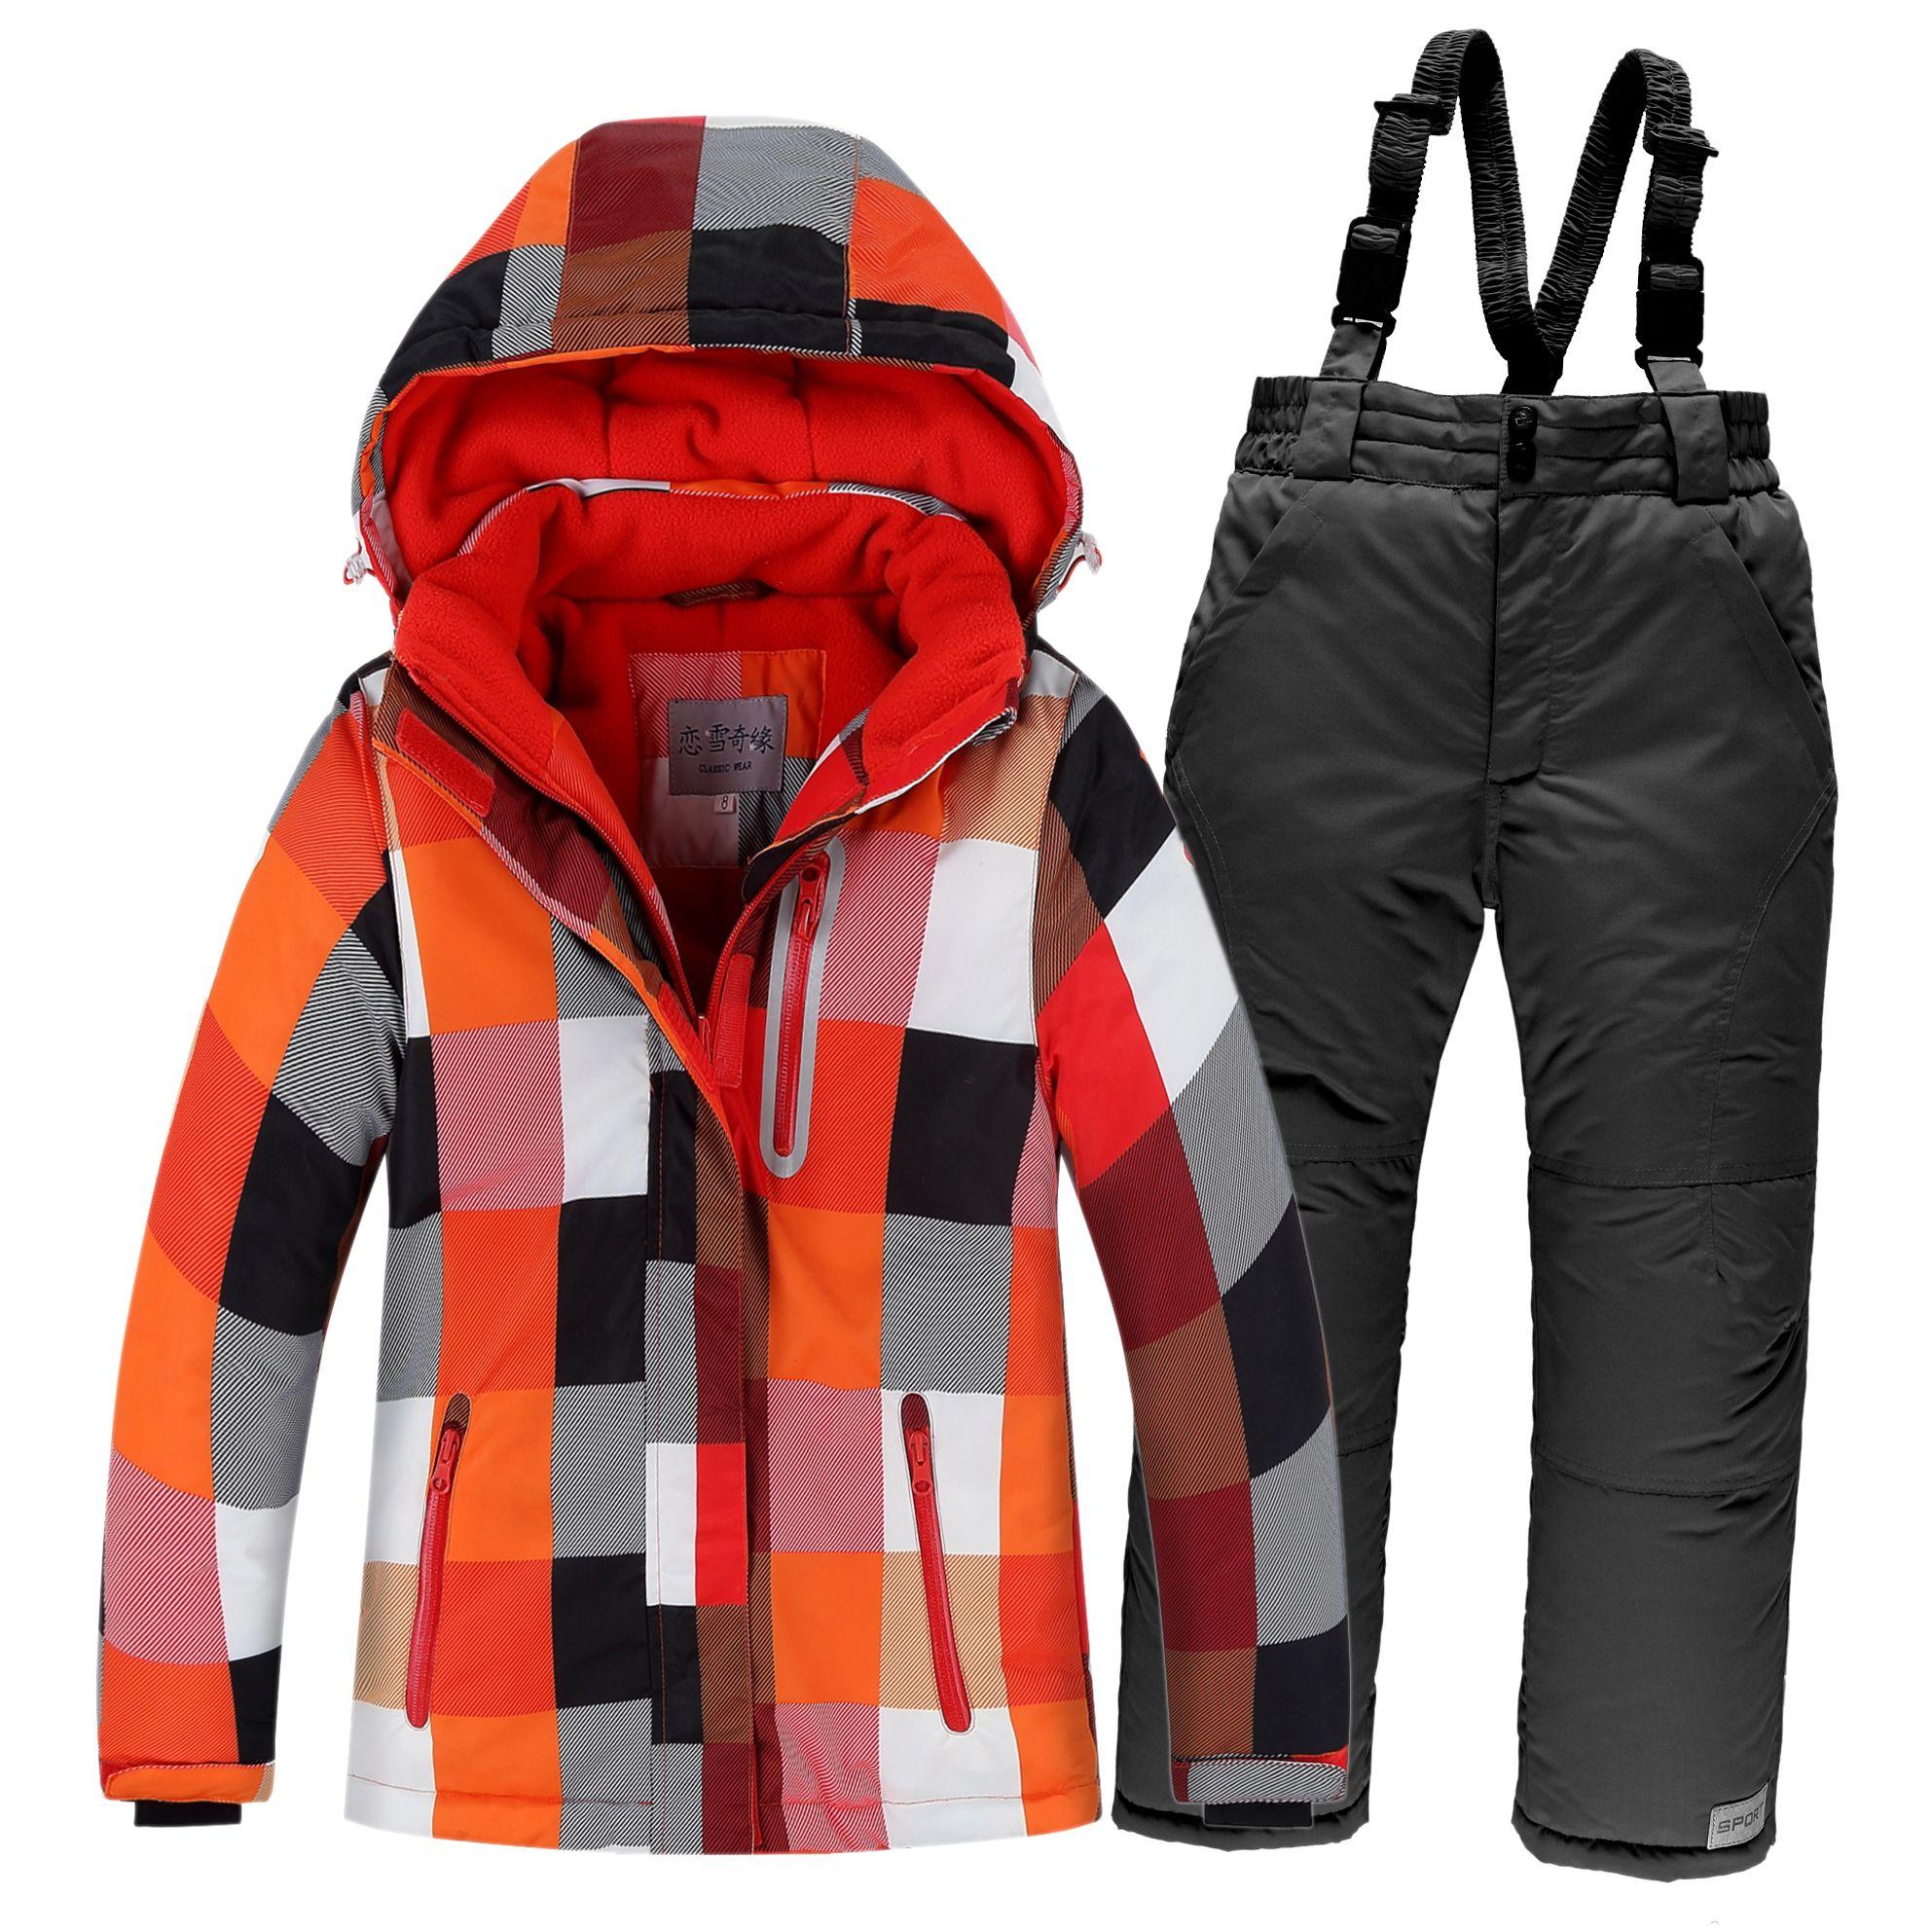 OLEKID Winter Children Ski Suit Windproof Warm Girls Clothing Set Jacket + Overalls Boys Clothes Set 3-16 Years Kids <font><b>Snow</b></font> Suits